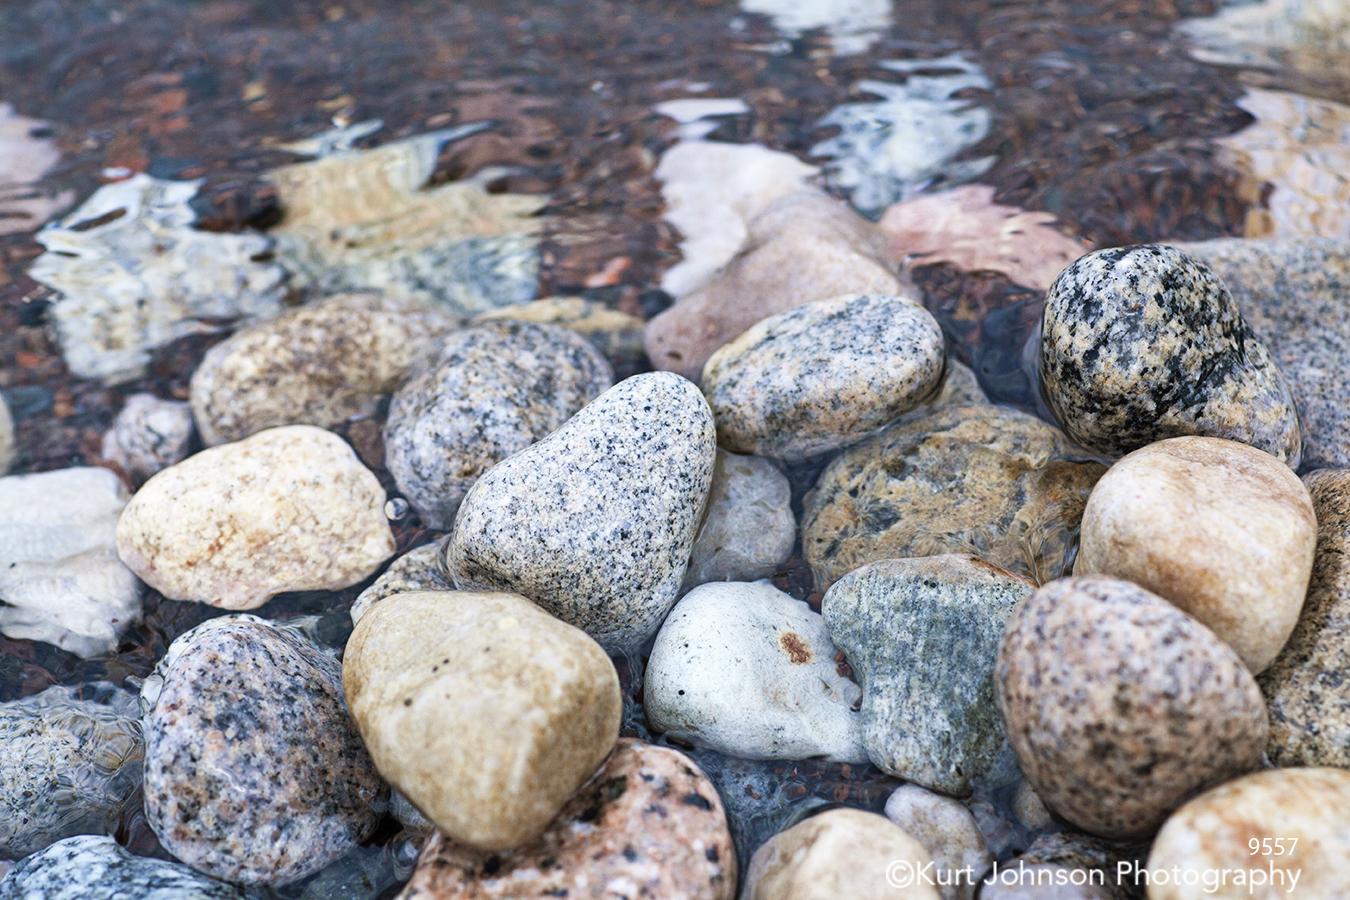 water rocks gray tan beige stone stones pebbles waves river stream